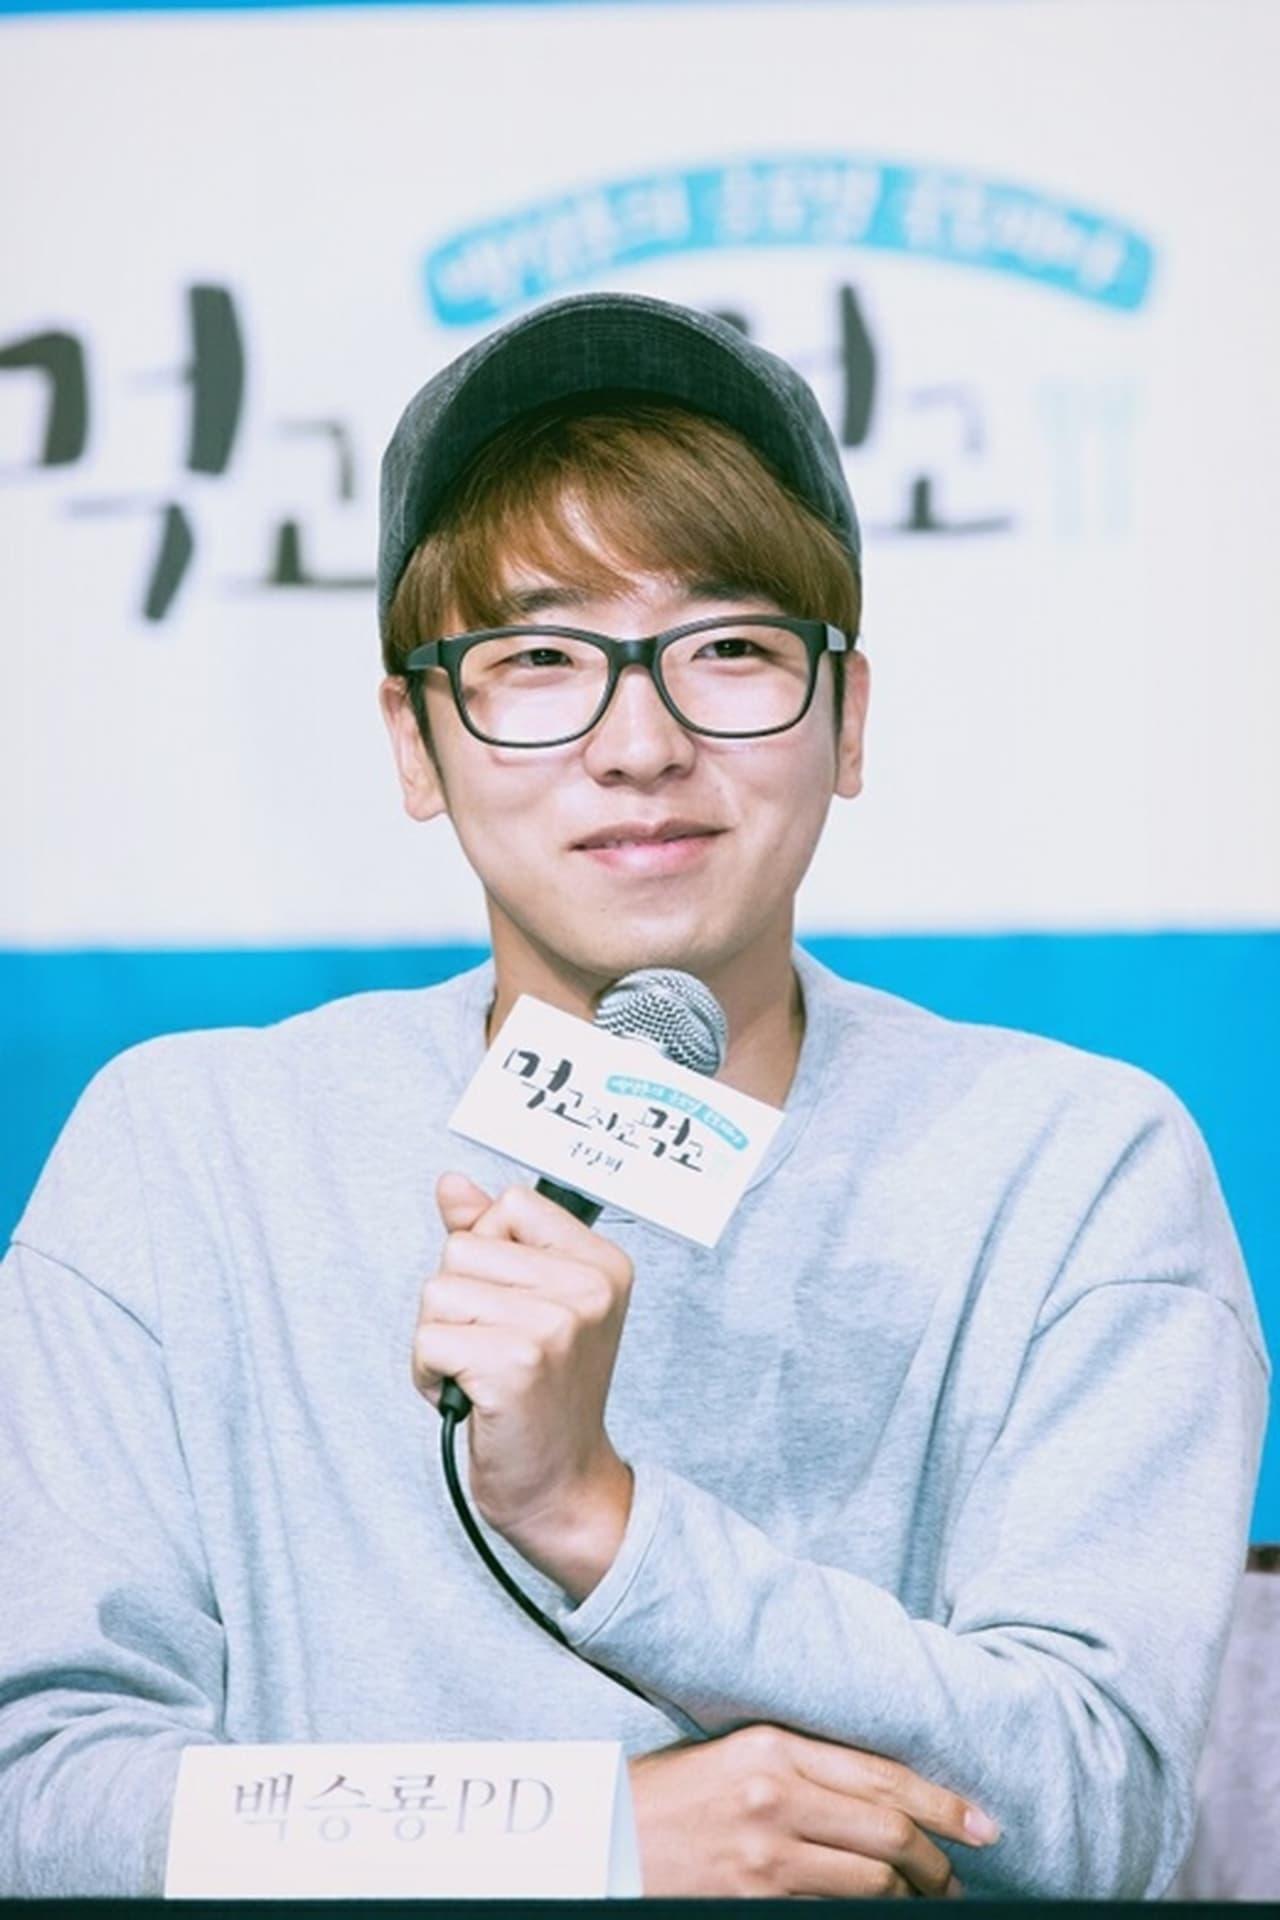 Seungryong Baek